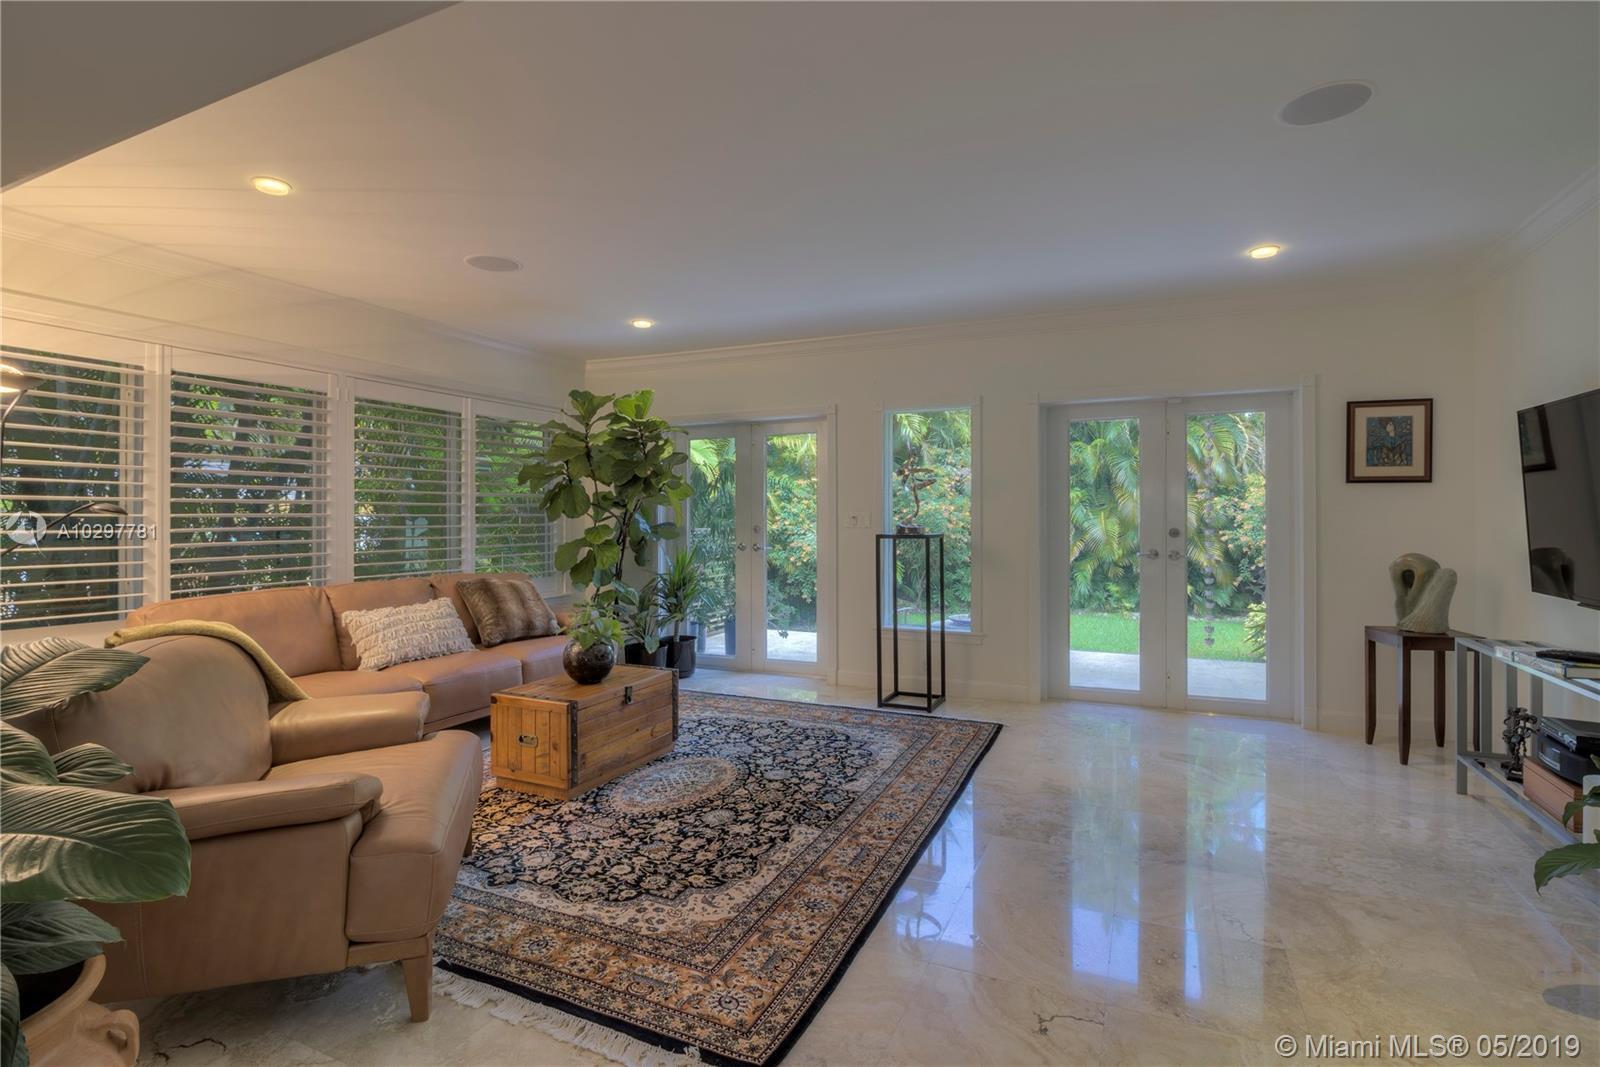 2910 Granada Blvd - Coral Gables, Florida